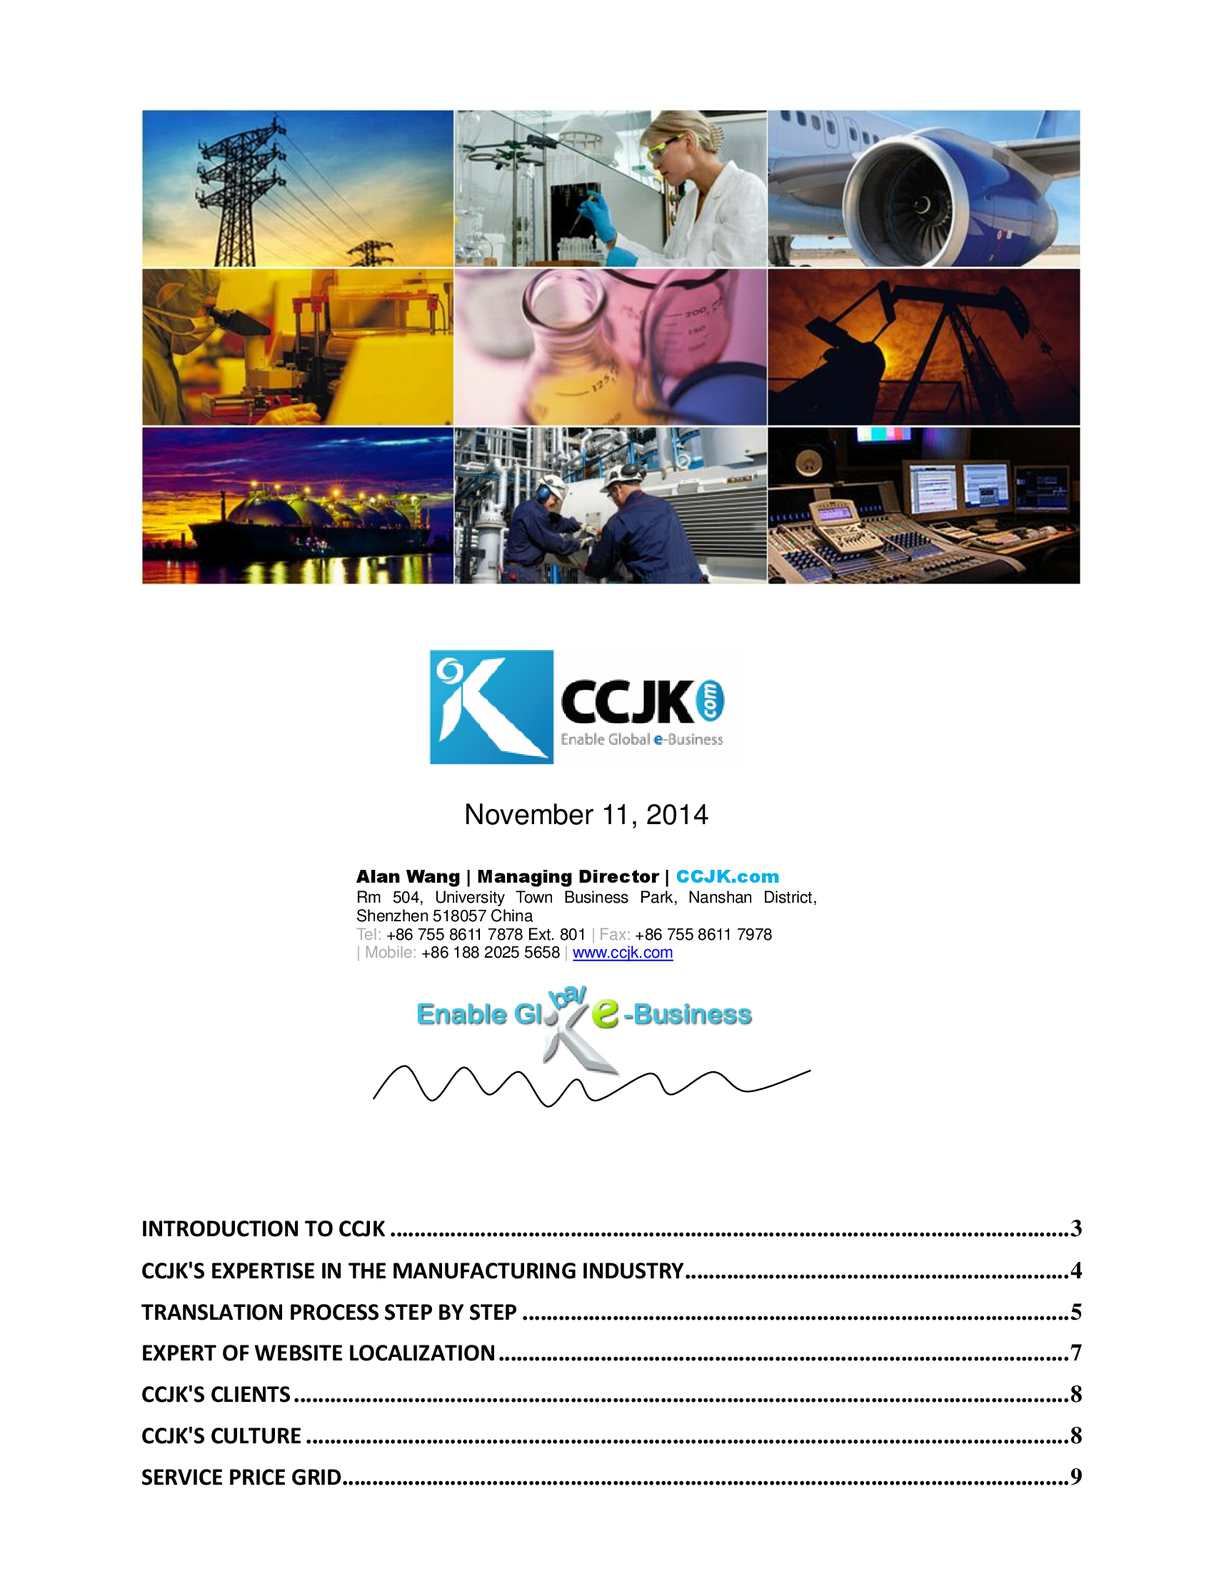 CCJK General Proposal